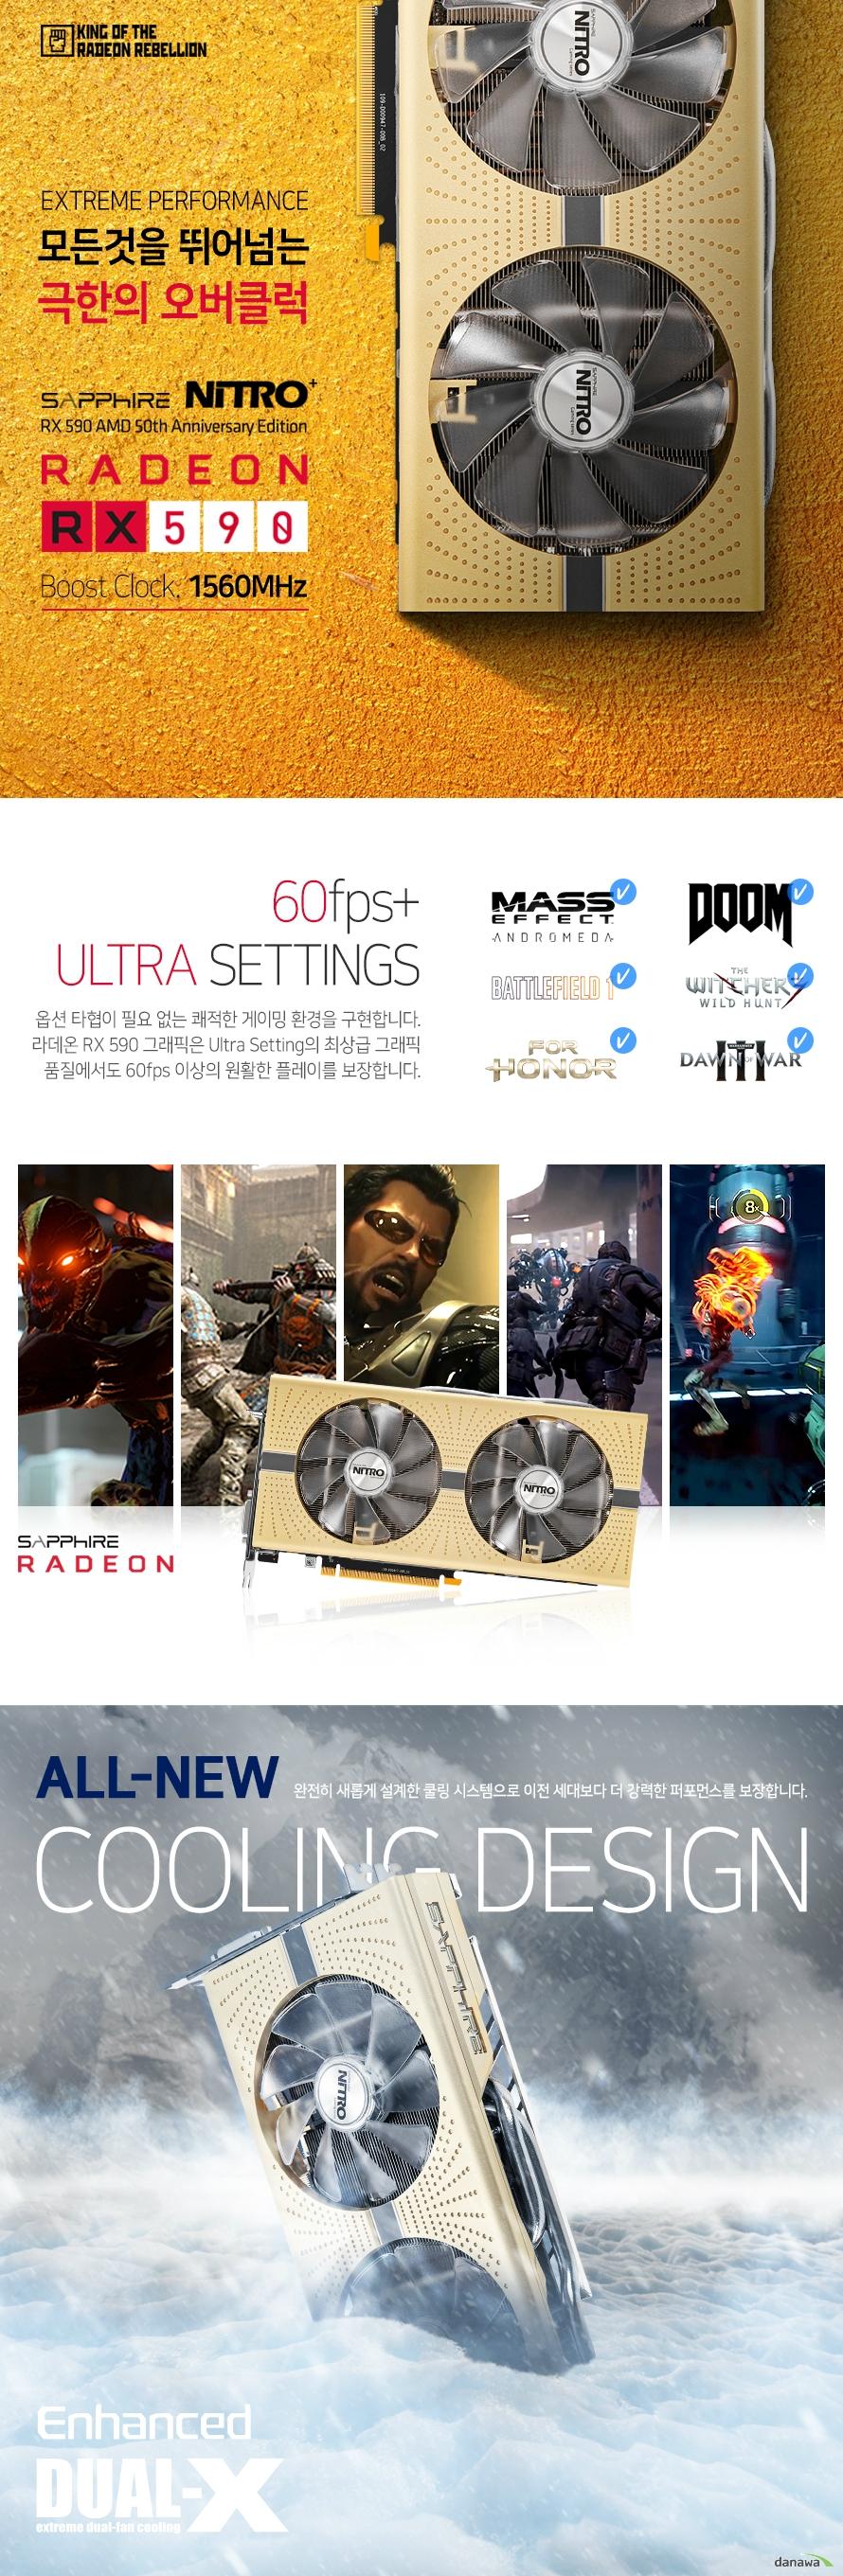 SAPPHIRE  라데온 RX 590 NITRO+ AMD 50th Edition OC D5 8GB Dual-X